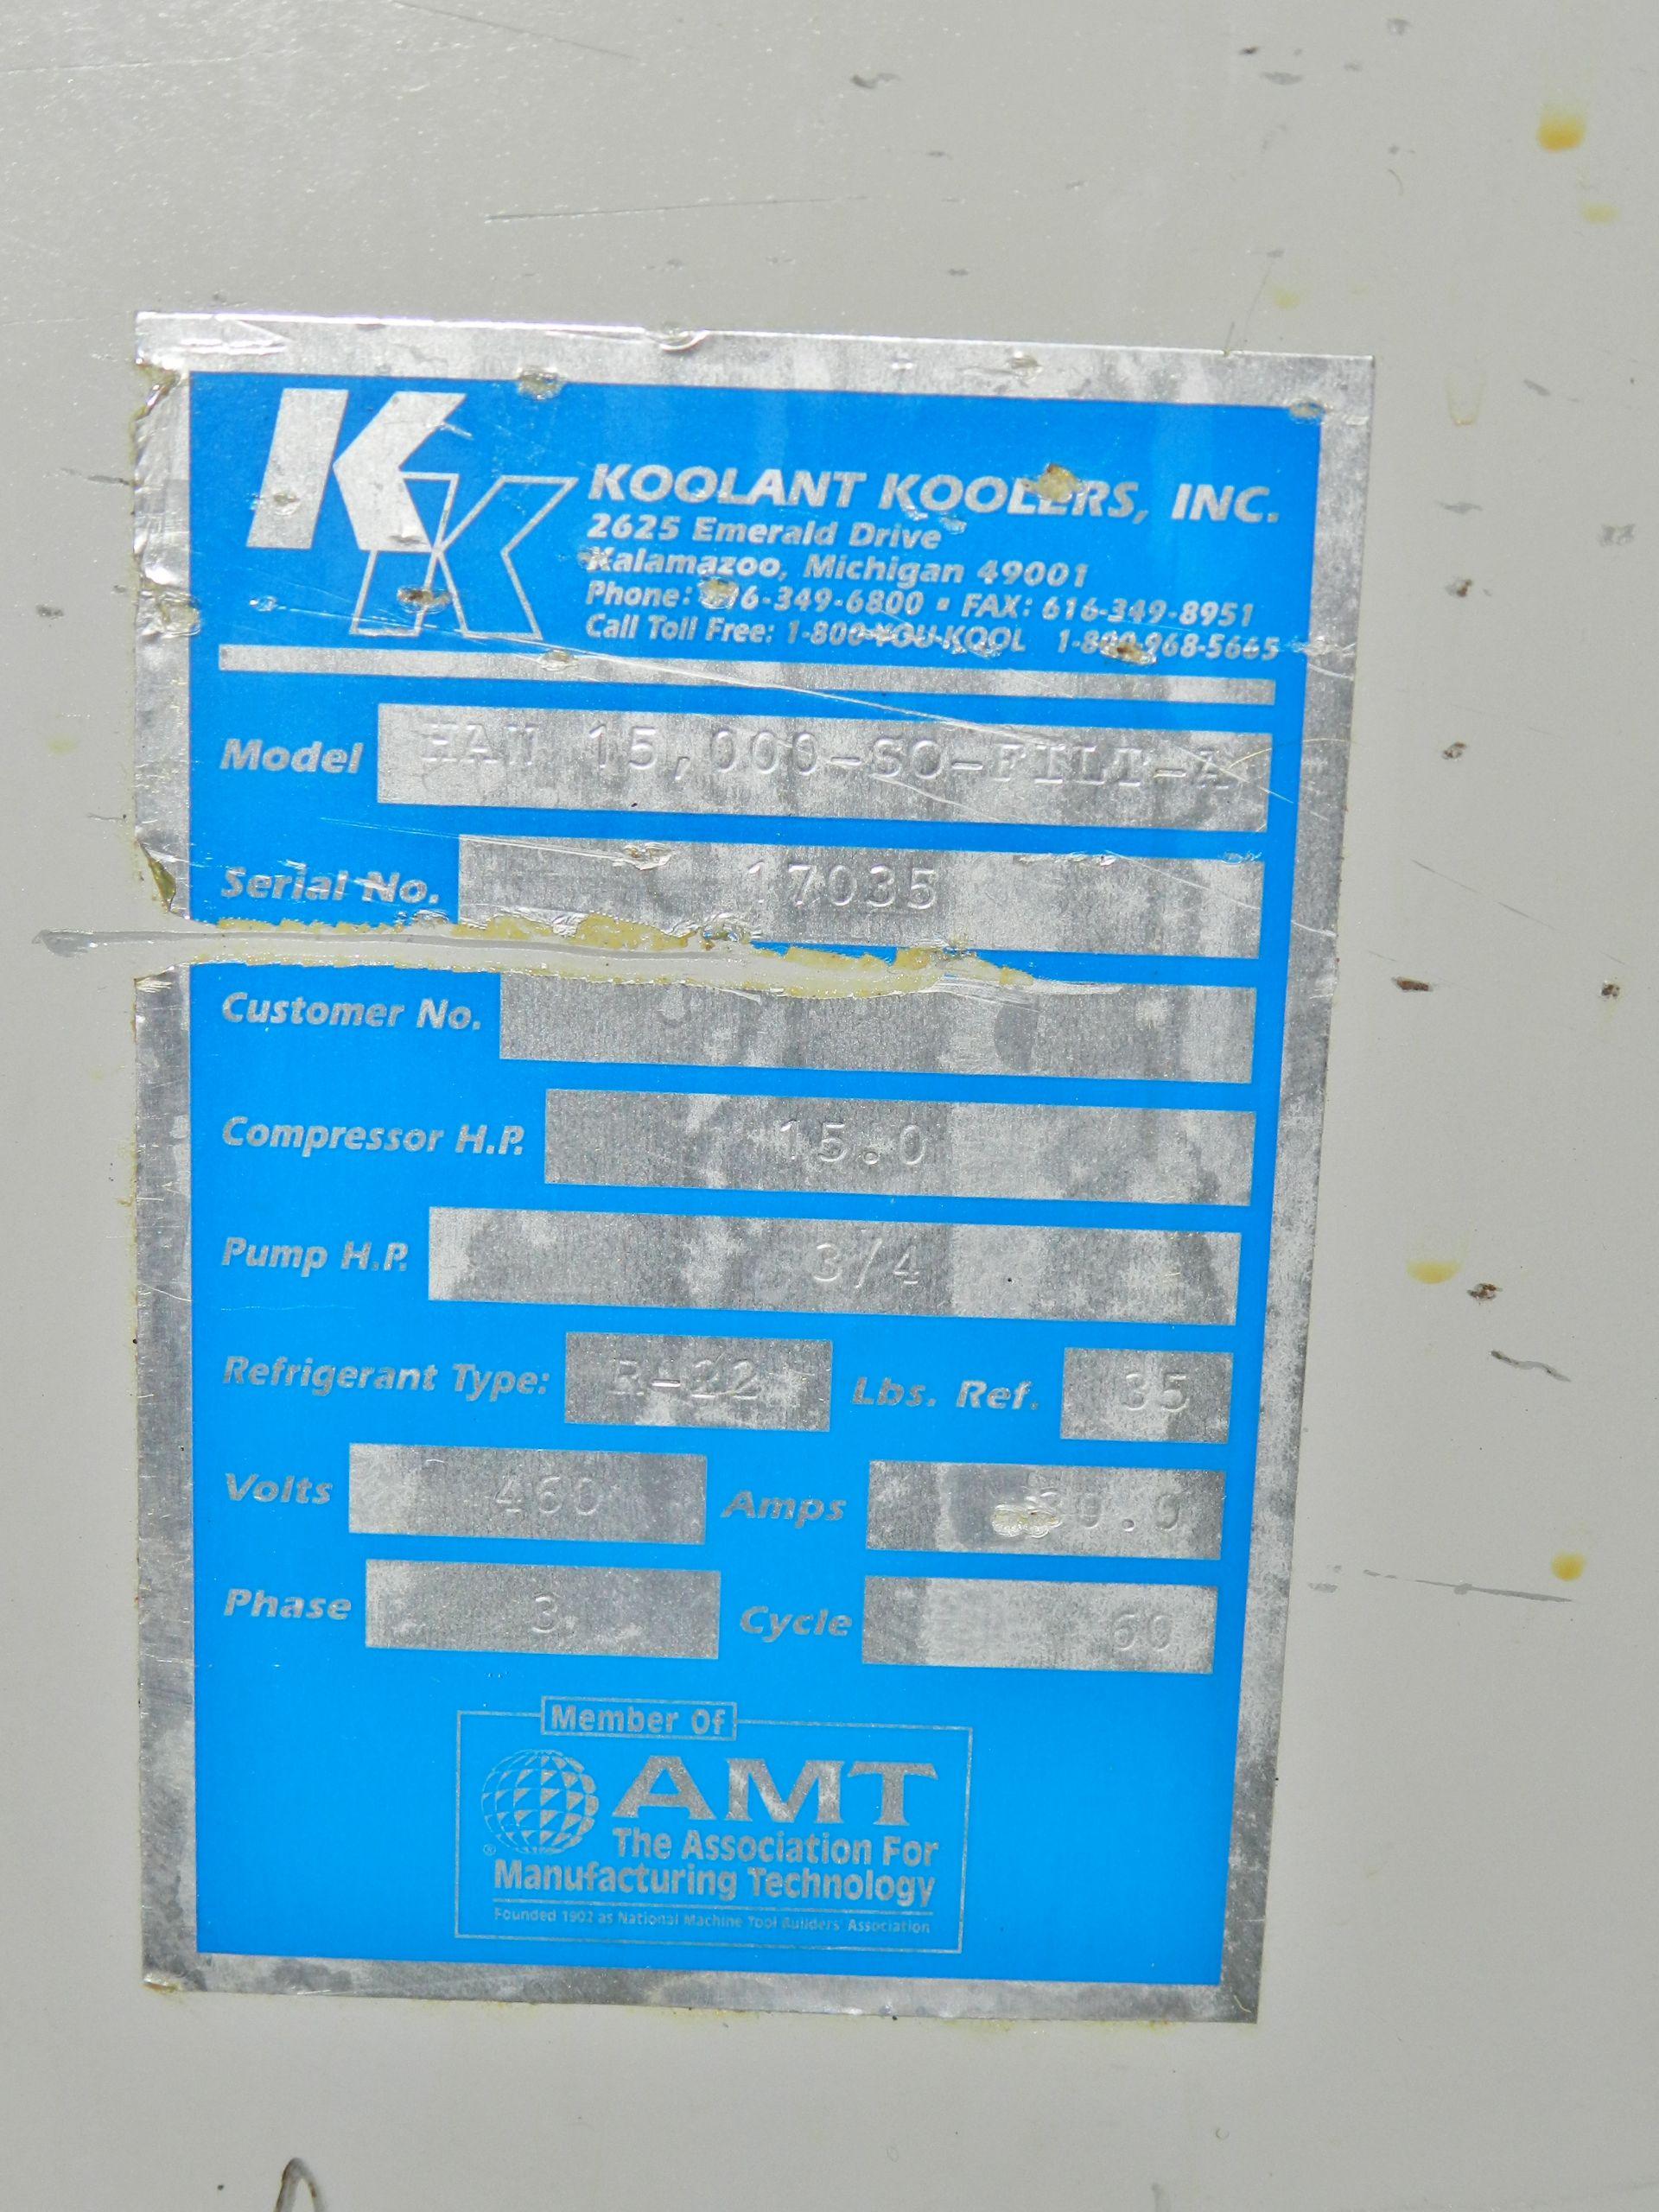 Lot 21 - Koolant Koolers 14 Ton Chiller HAW 15,000-SO-FILT-A